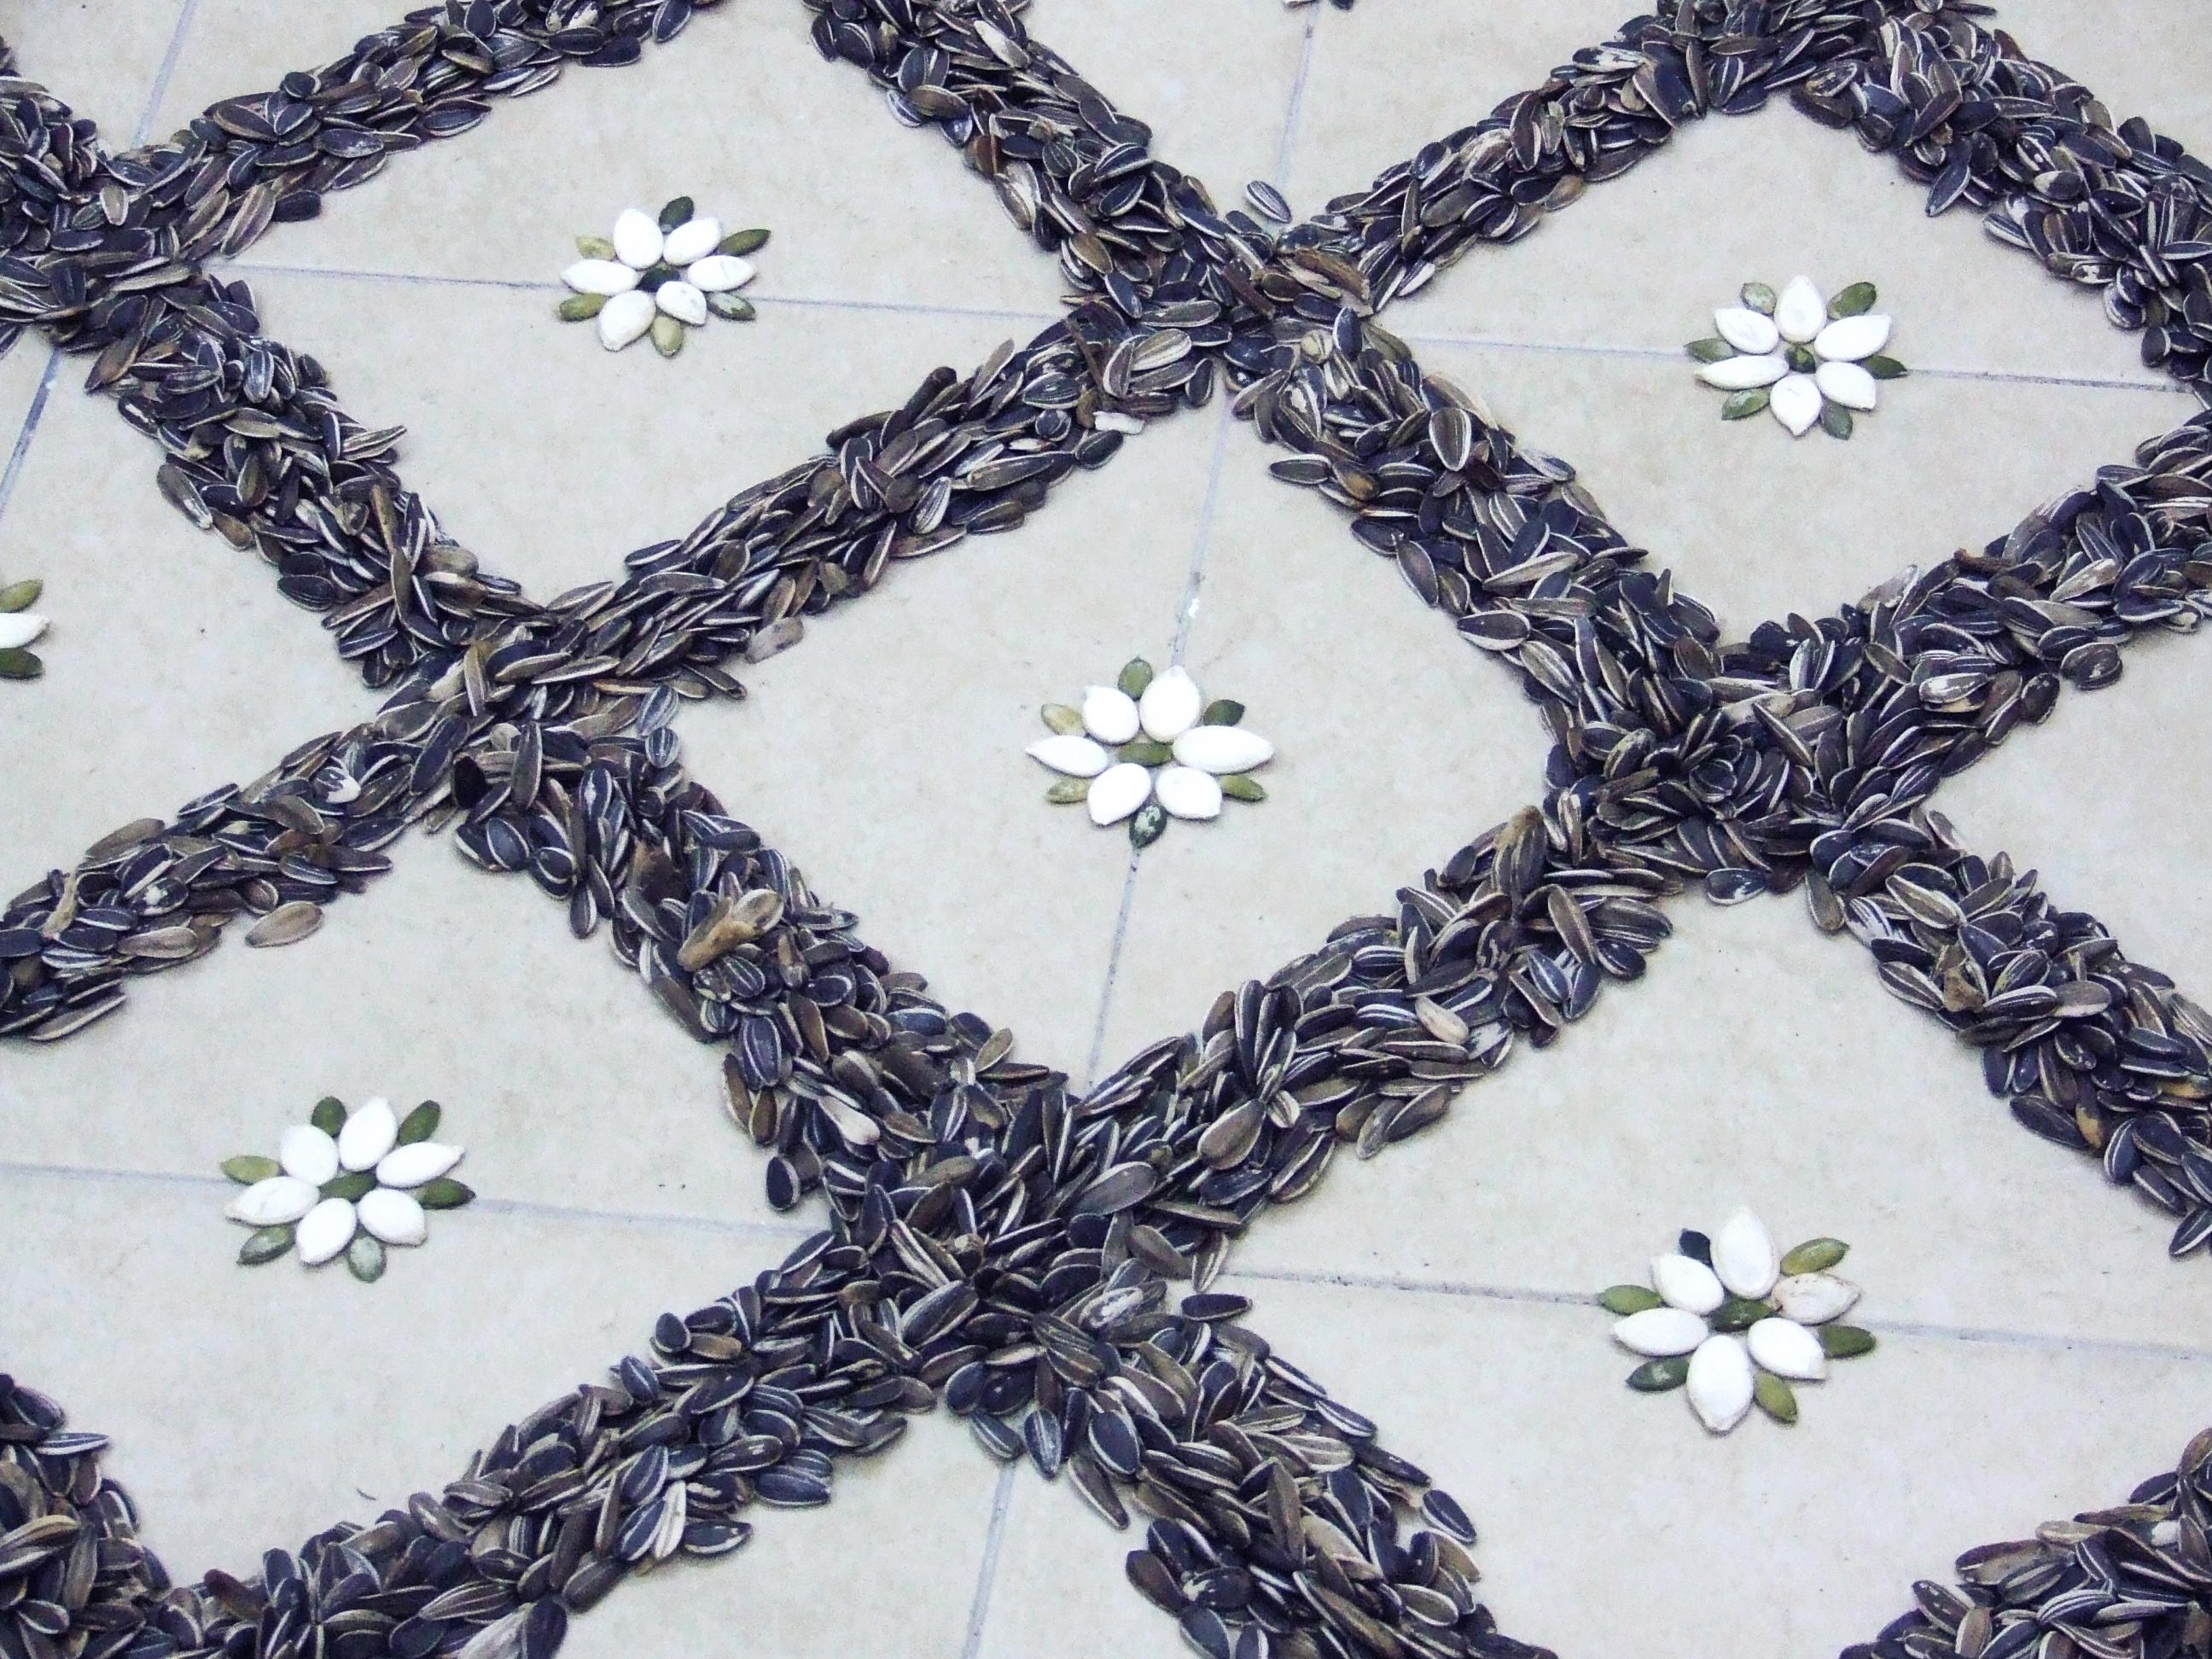 Seeds floor_6_Shahar Tuchner.jpg